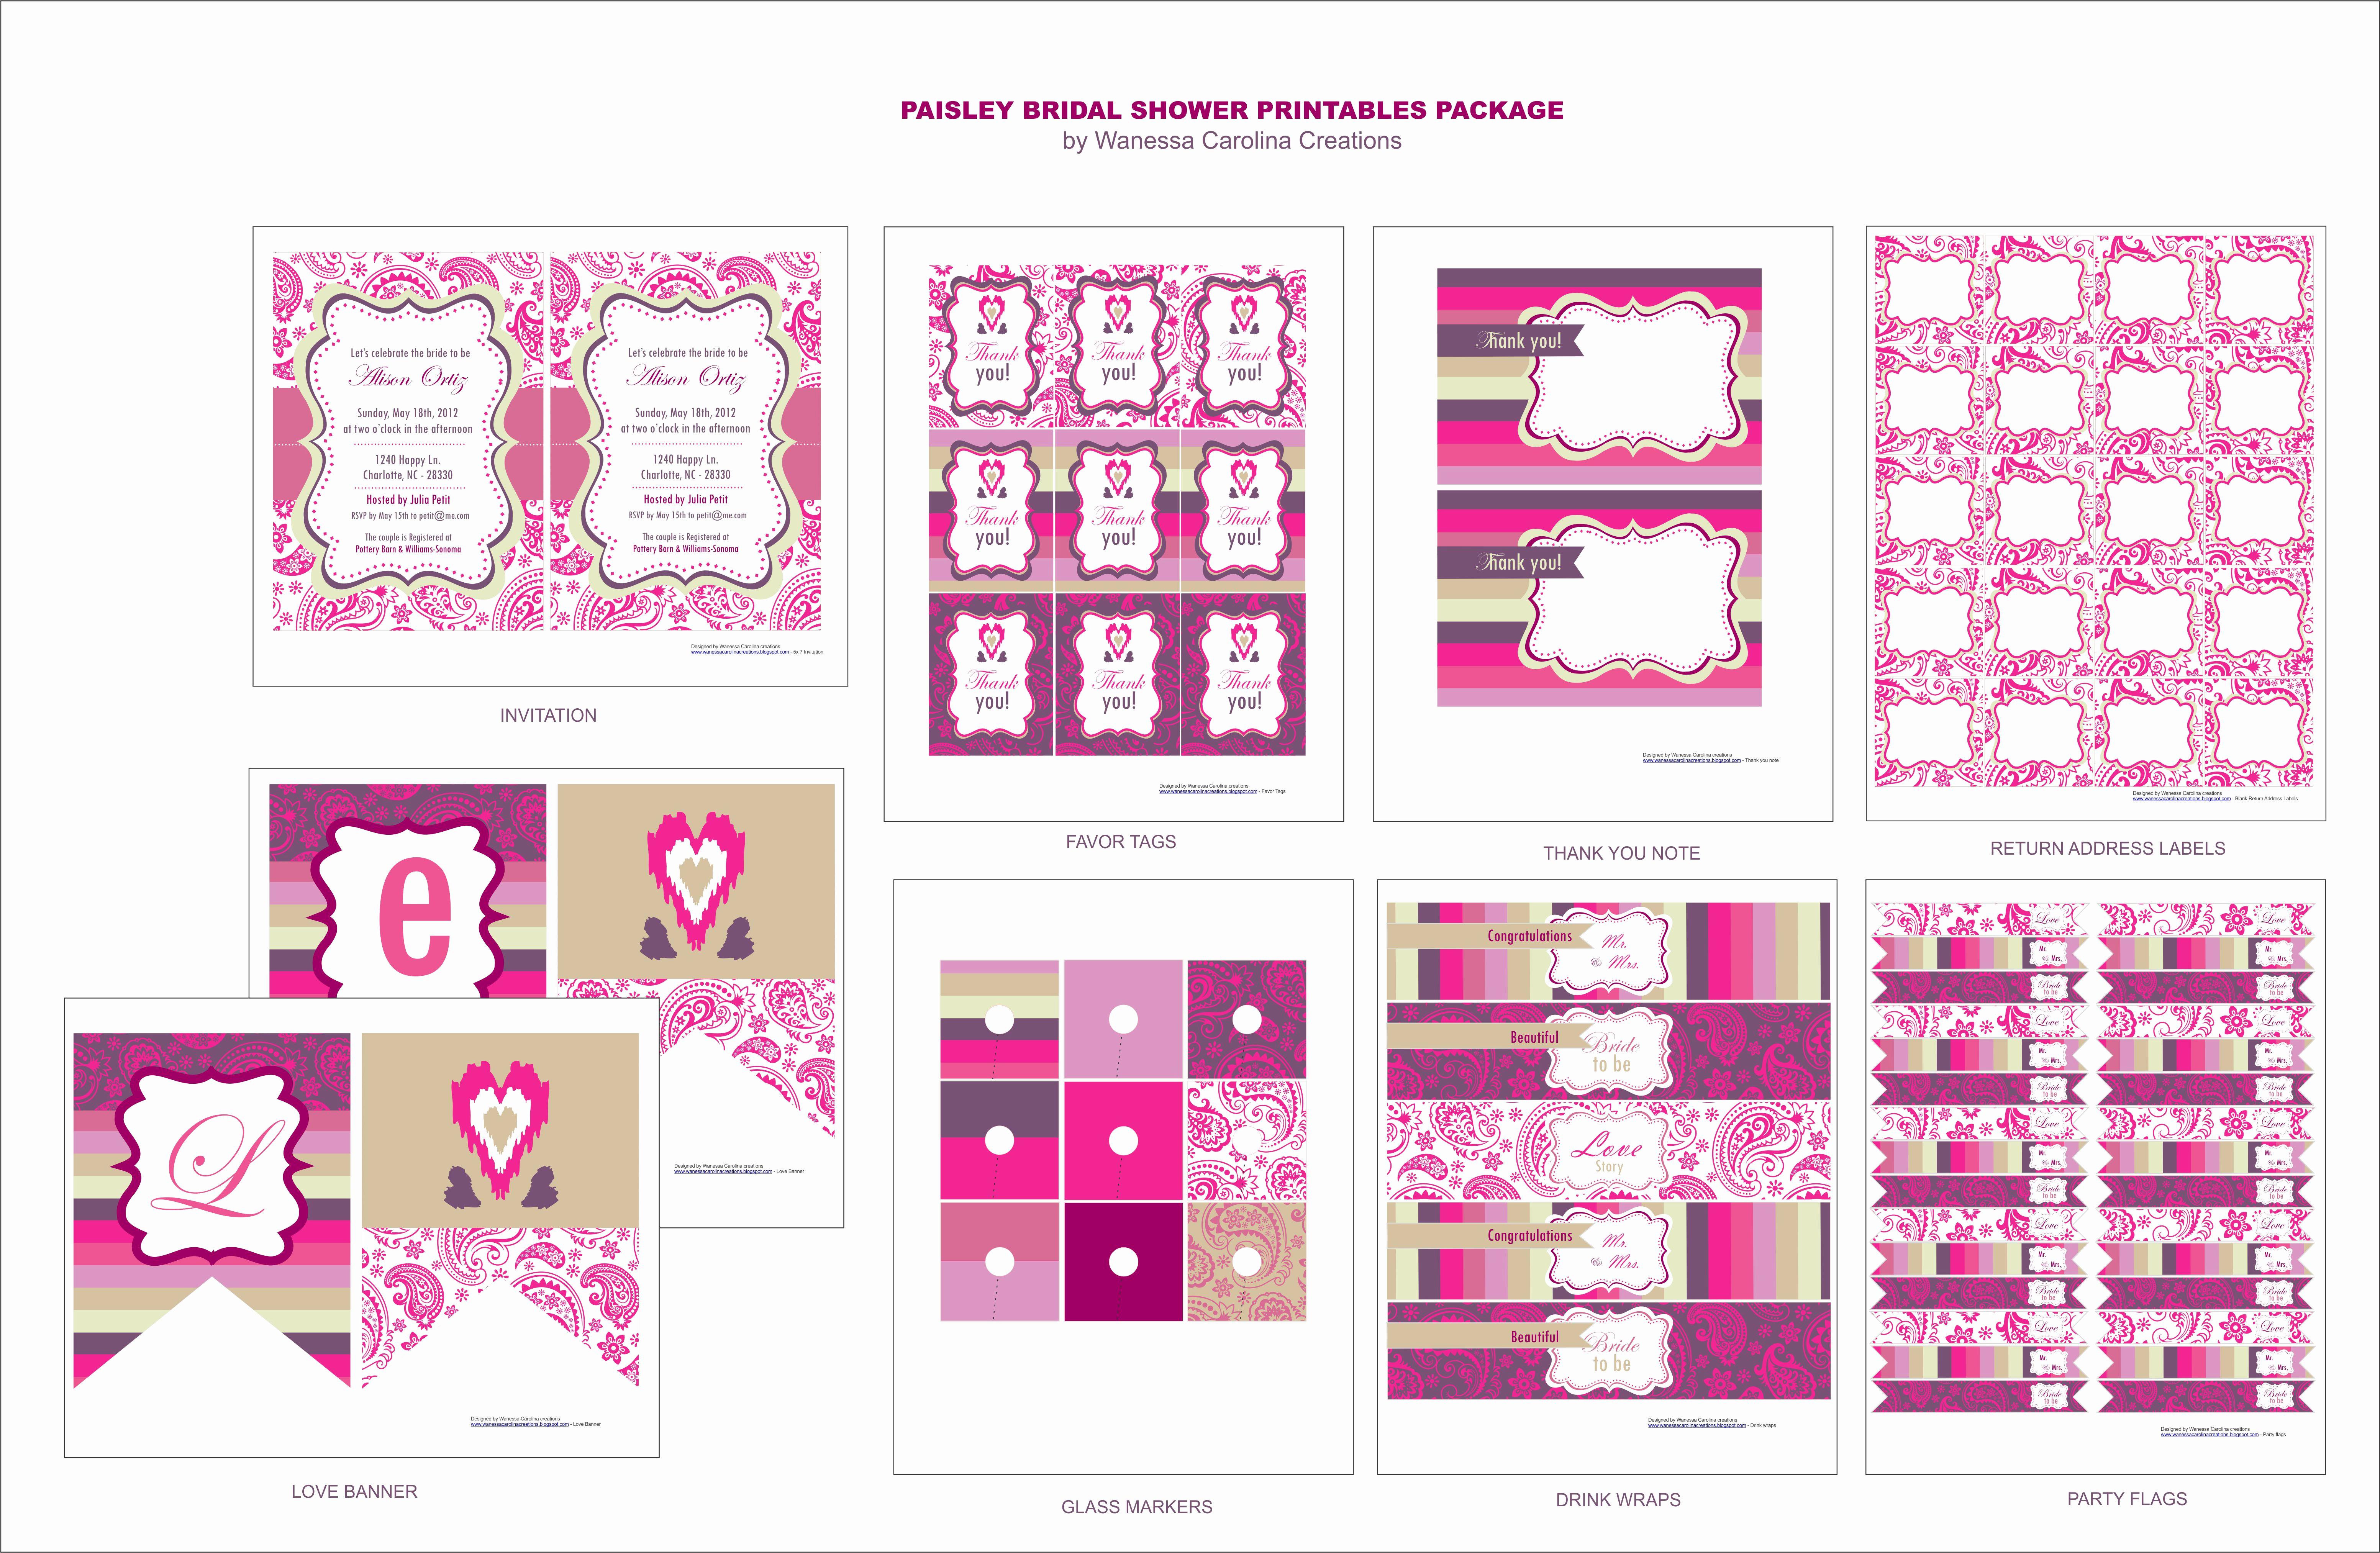 Free Printable Bridal Shower Invitations Luxury Free Bridal Shower Printables From Wanessa Carolina